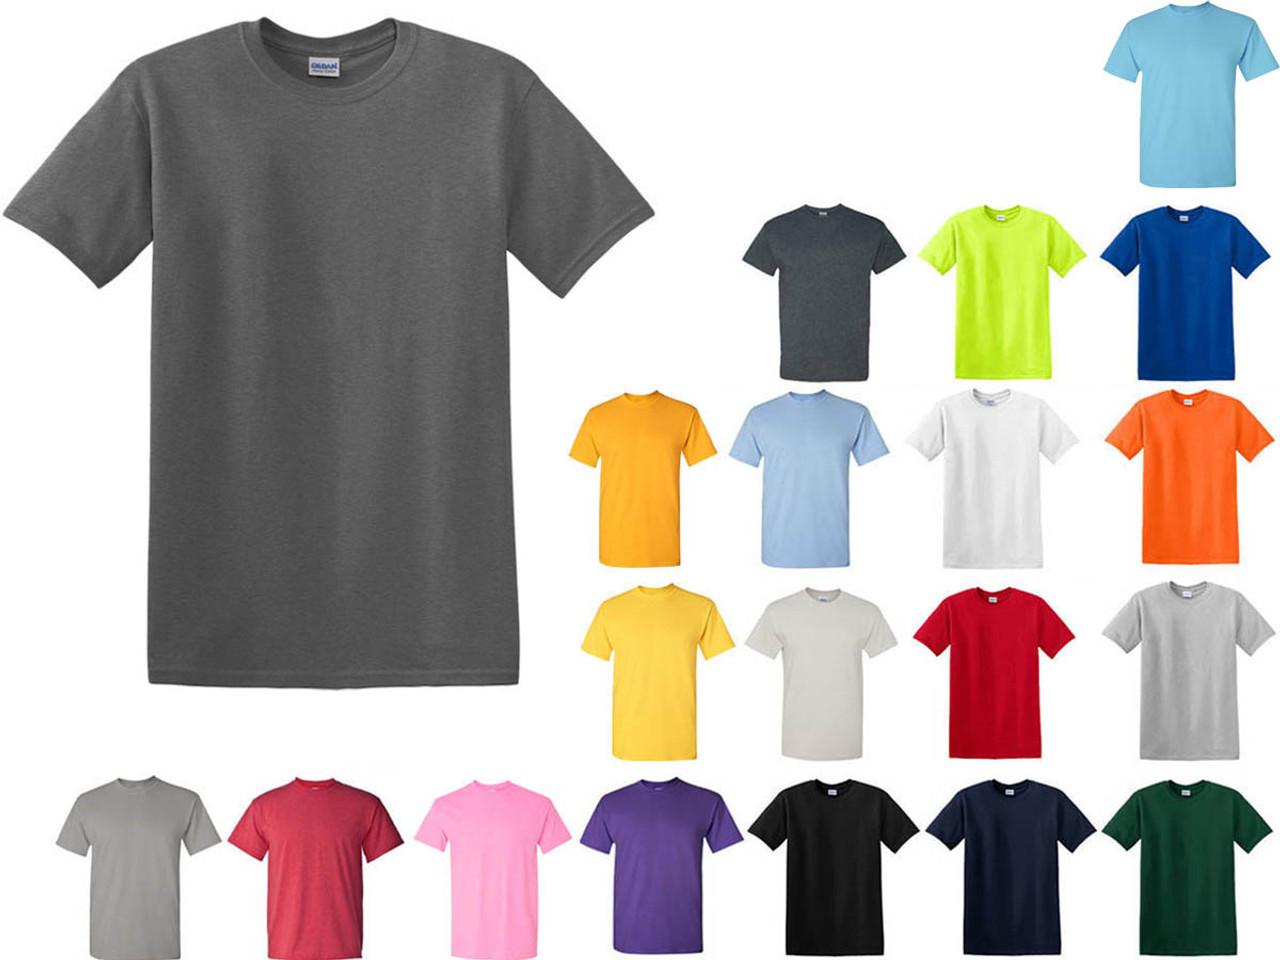 Image result for gildan shirts